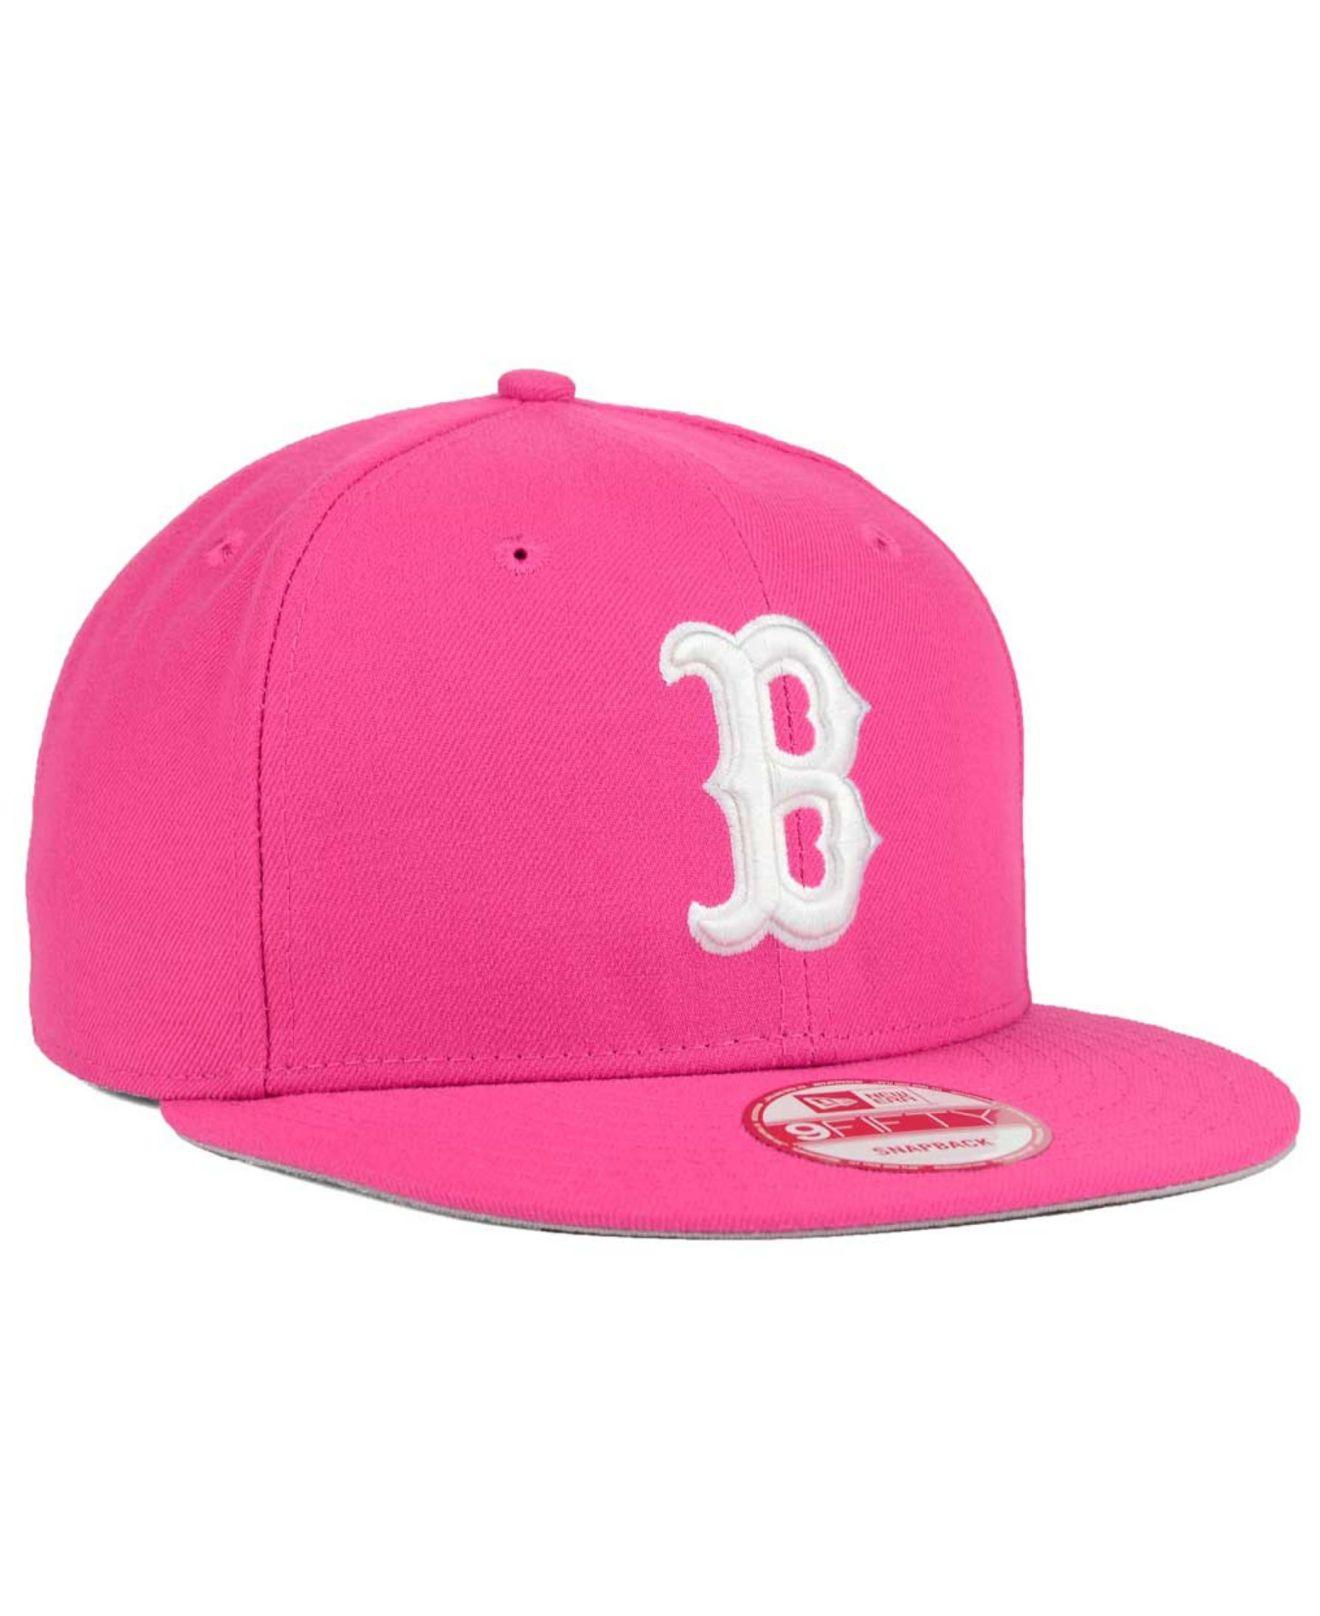 620d54c3ca5 ... czech lyst ktz boston red sox c dub 9fifty snapback cap in pink for men  6ec3a